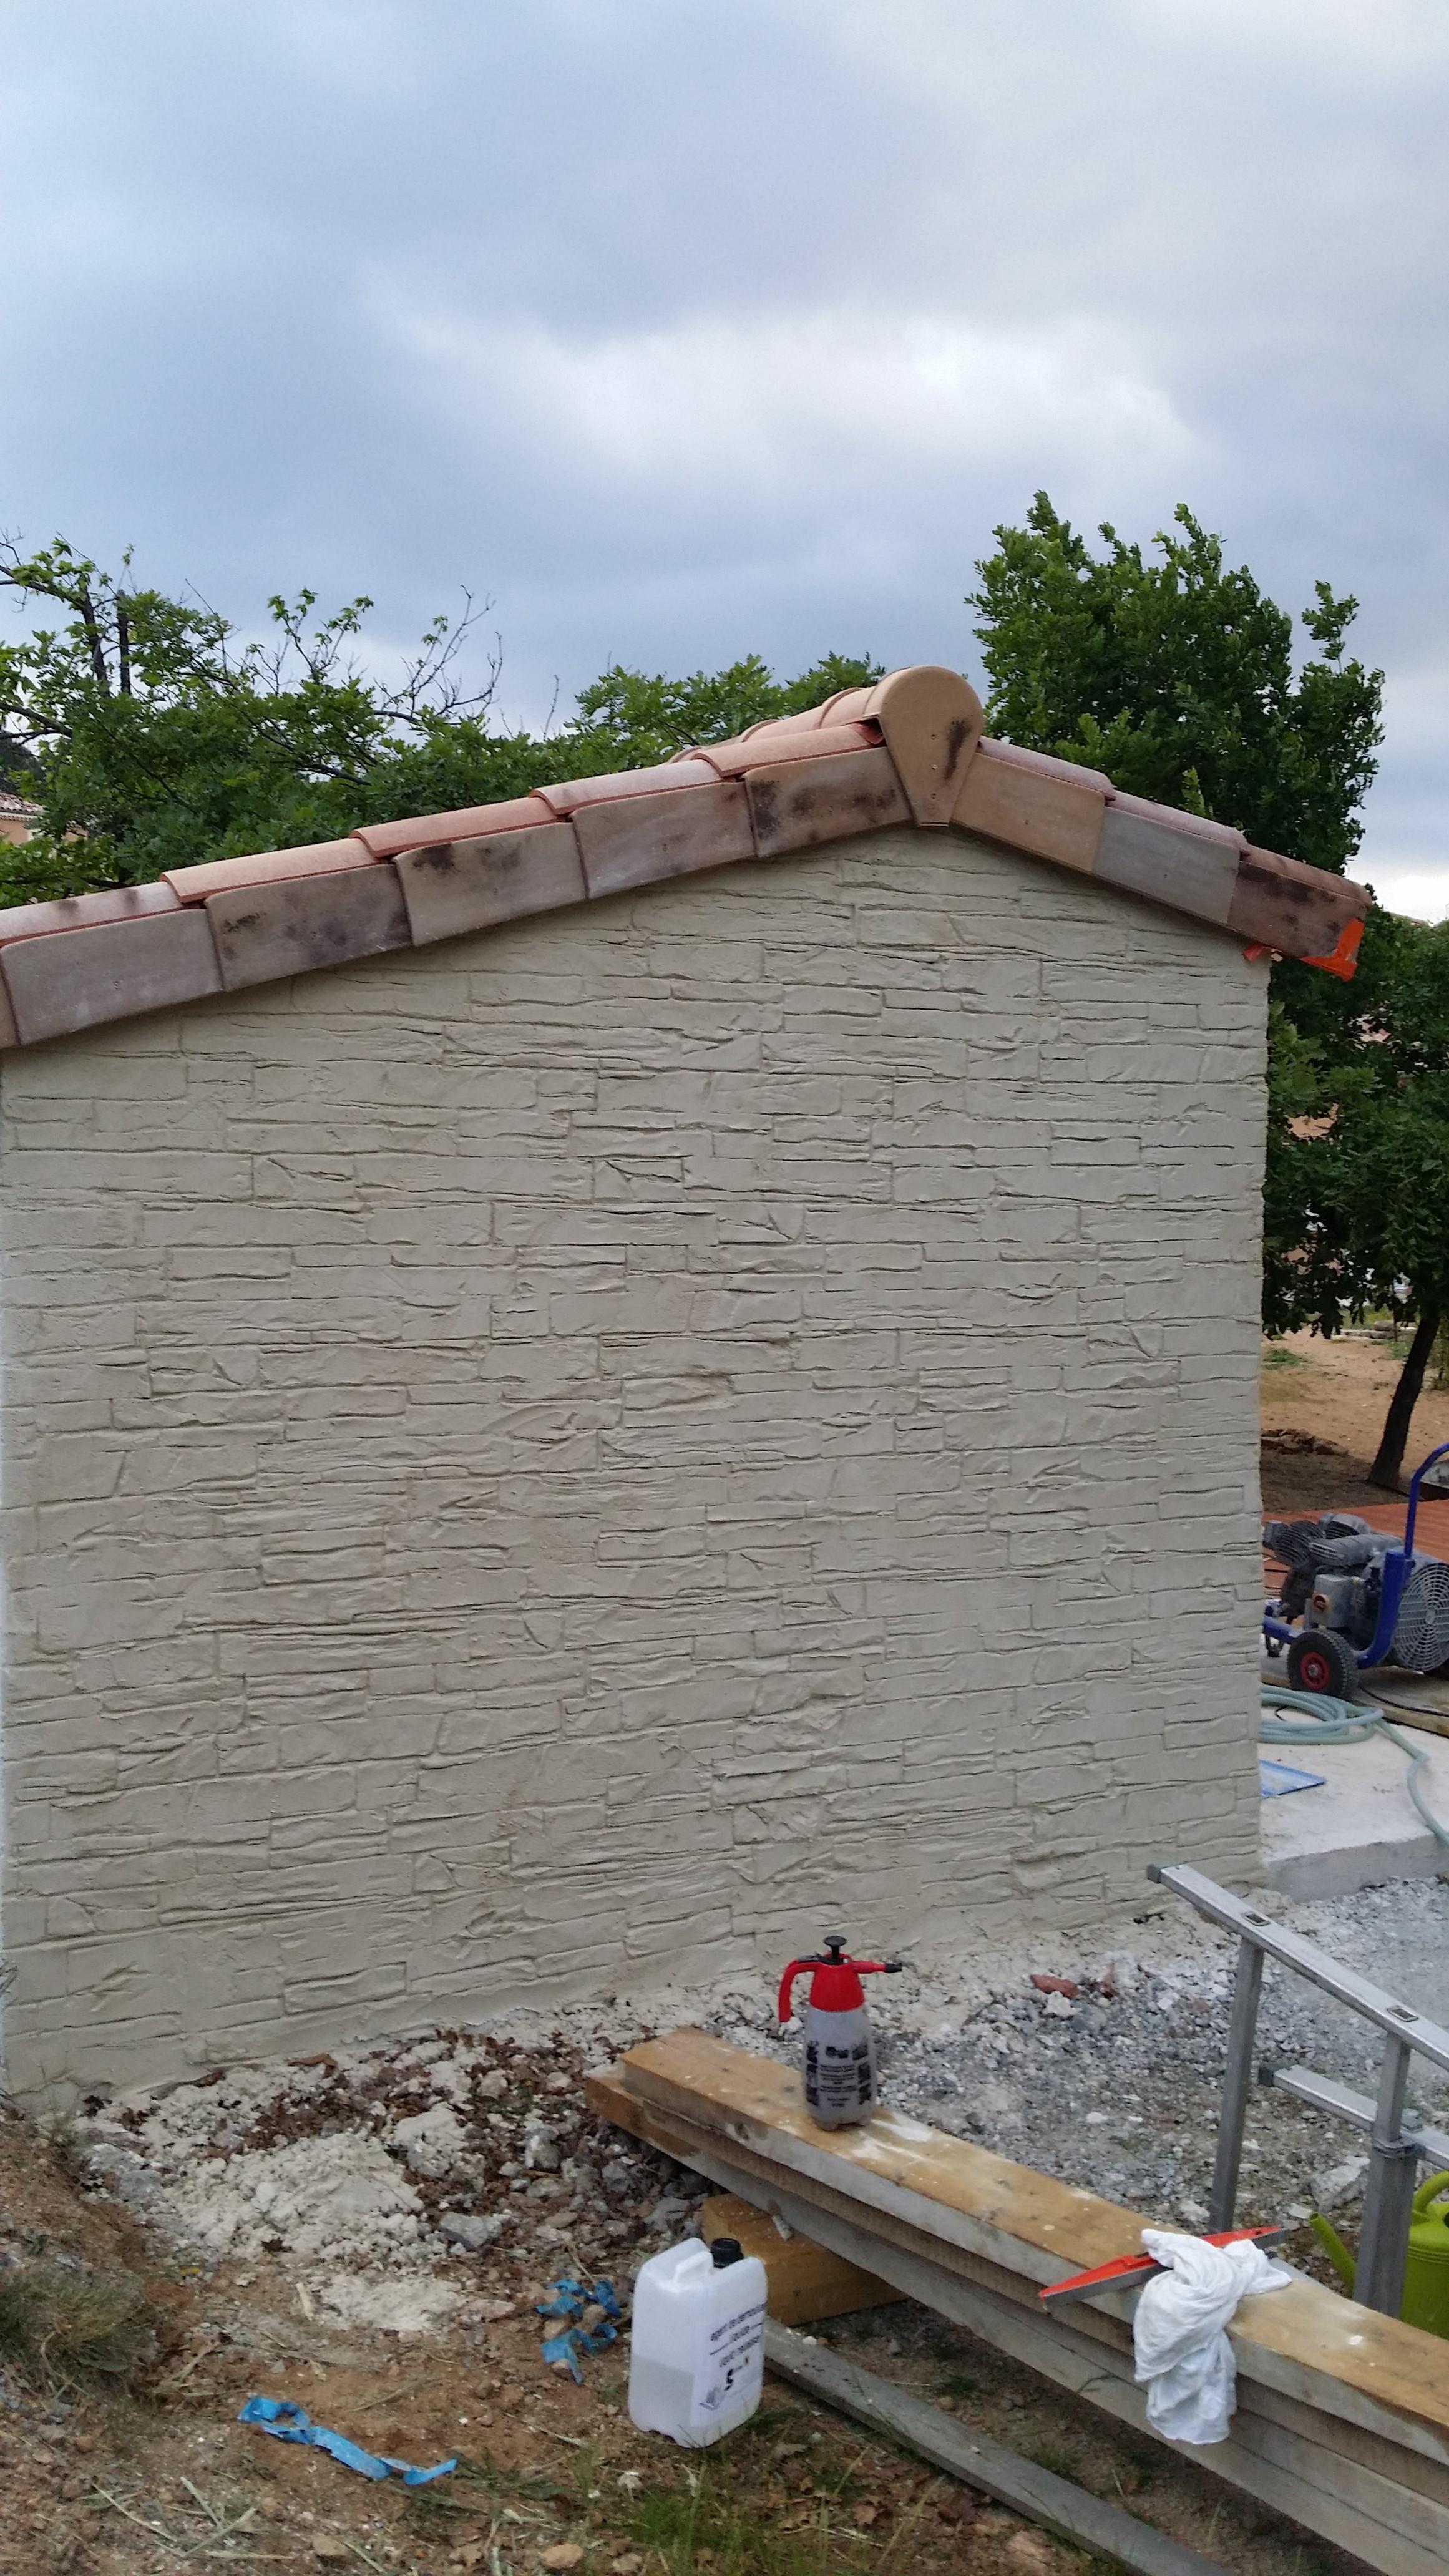 Mortier faux rochers mortier pierres murales mur for Fausses pierres murales